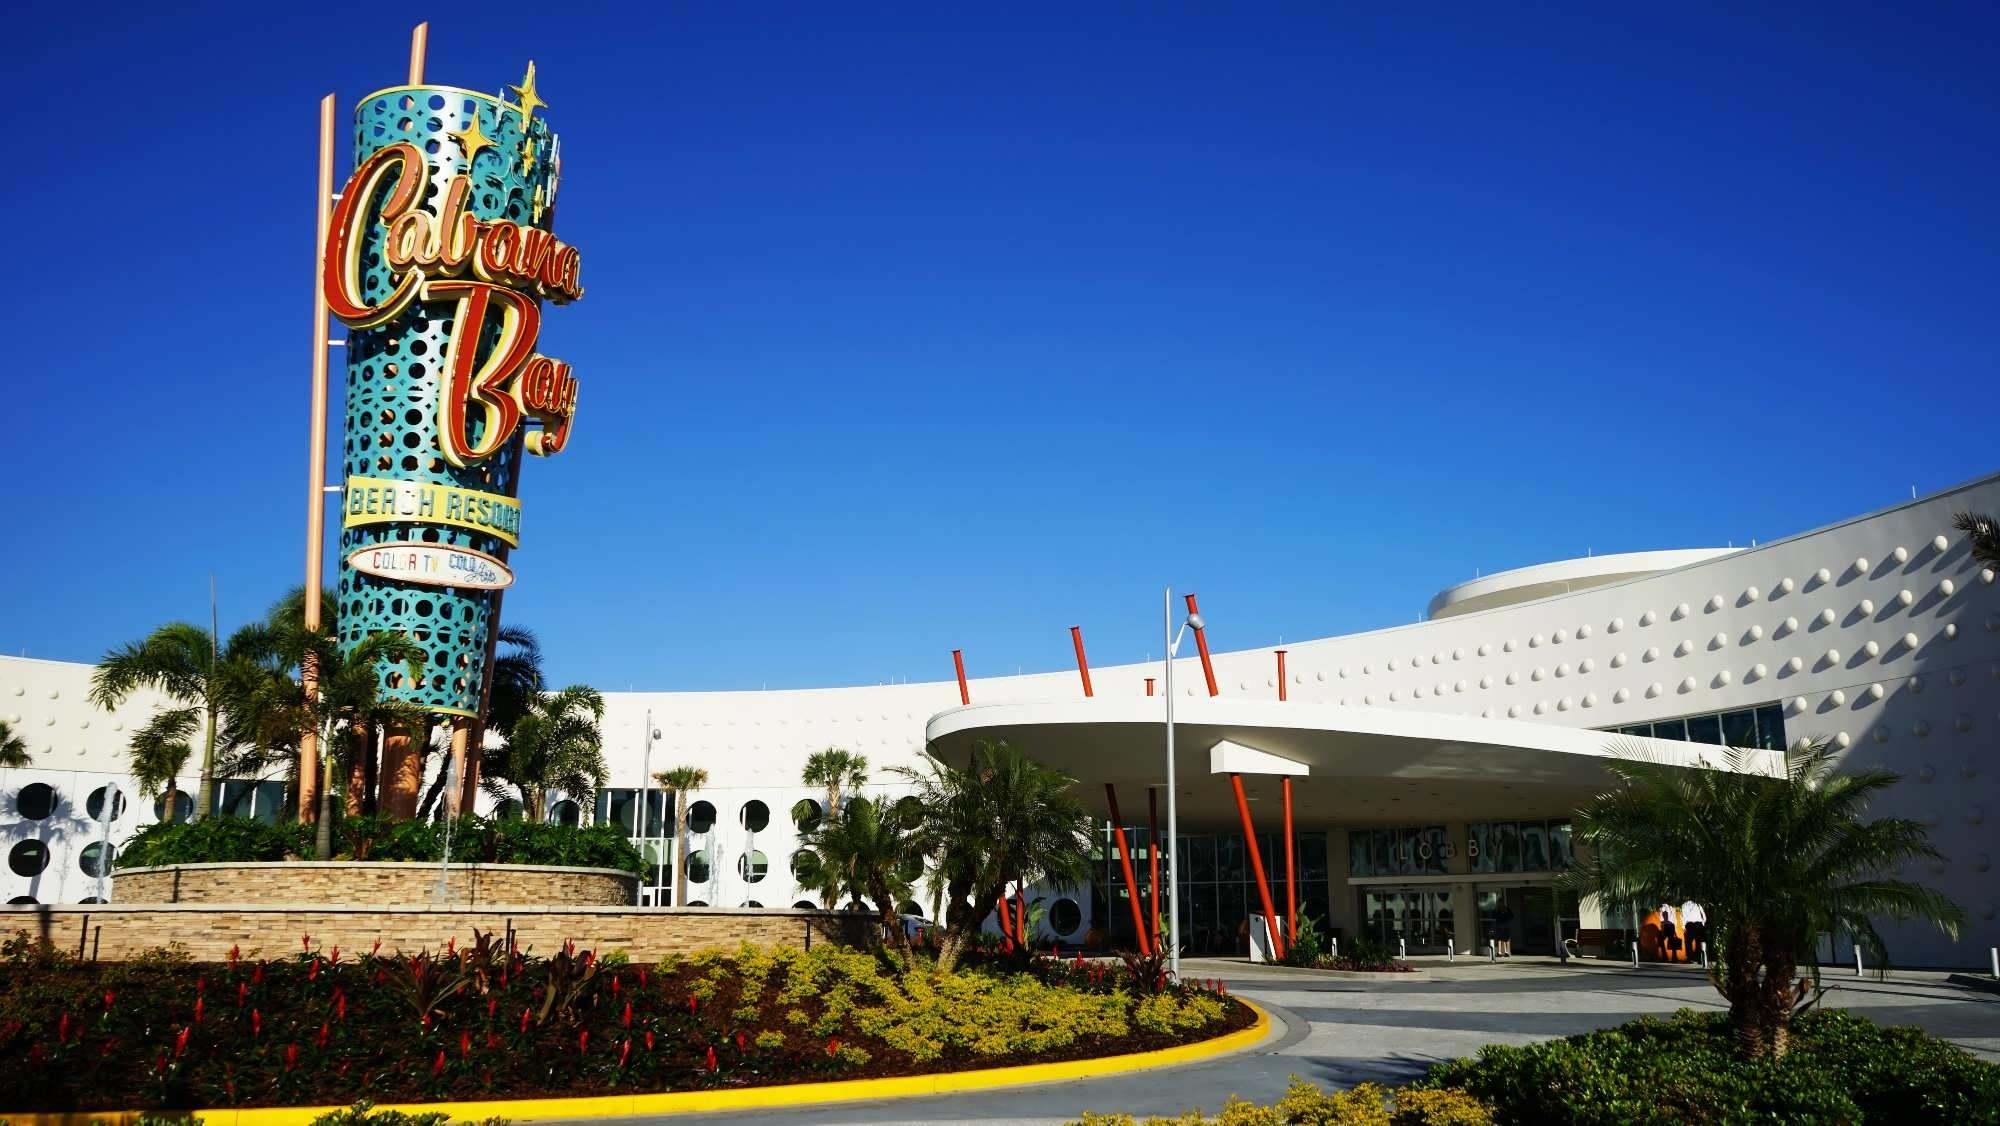 Why Cabana Bay Beach Resort is the best family resort in Orlando